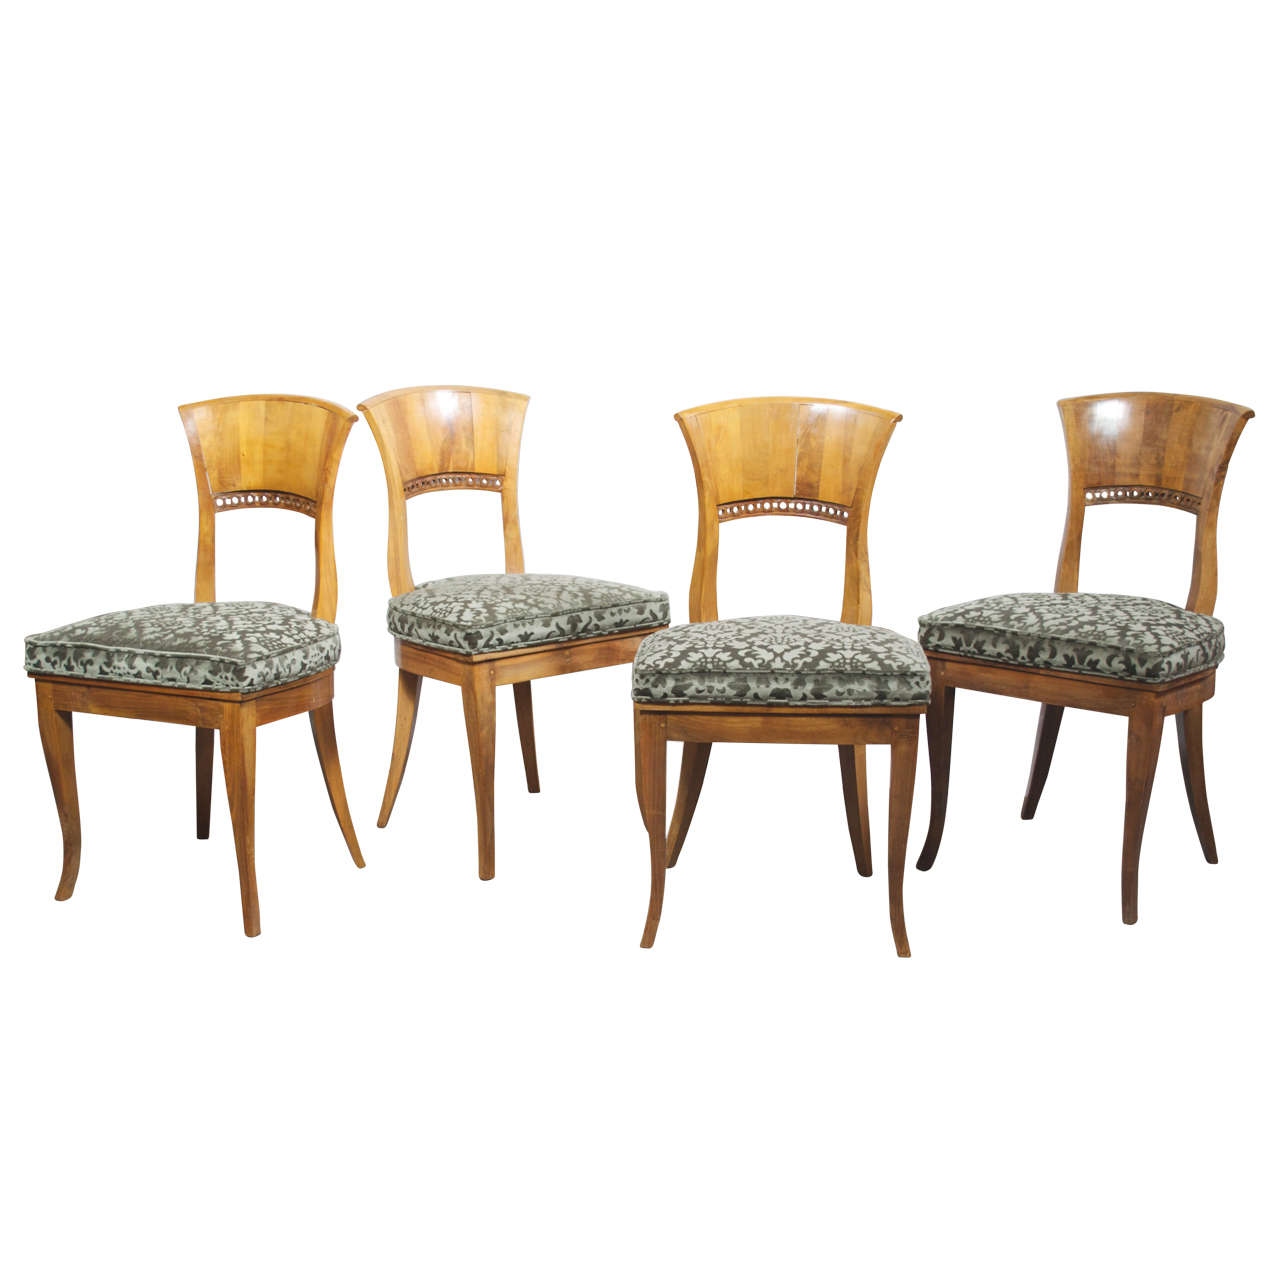 Set Of Four 19th Century Biedermeier Chairs Saturday Sale At 1stdibs